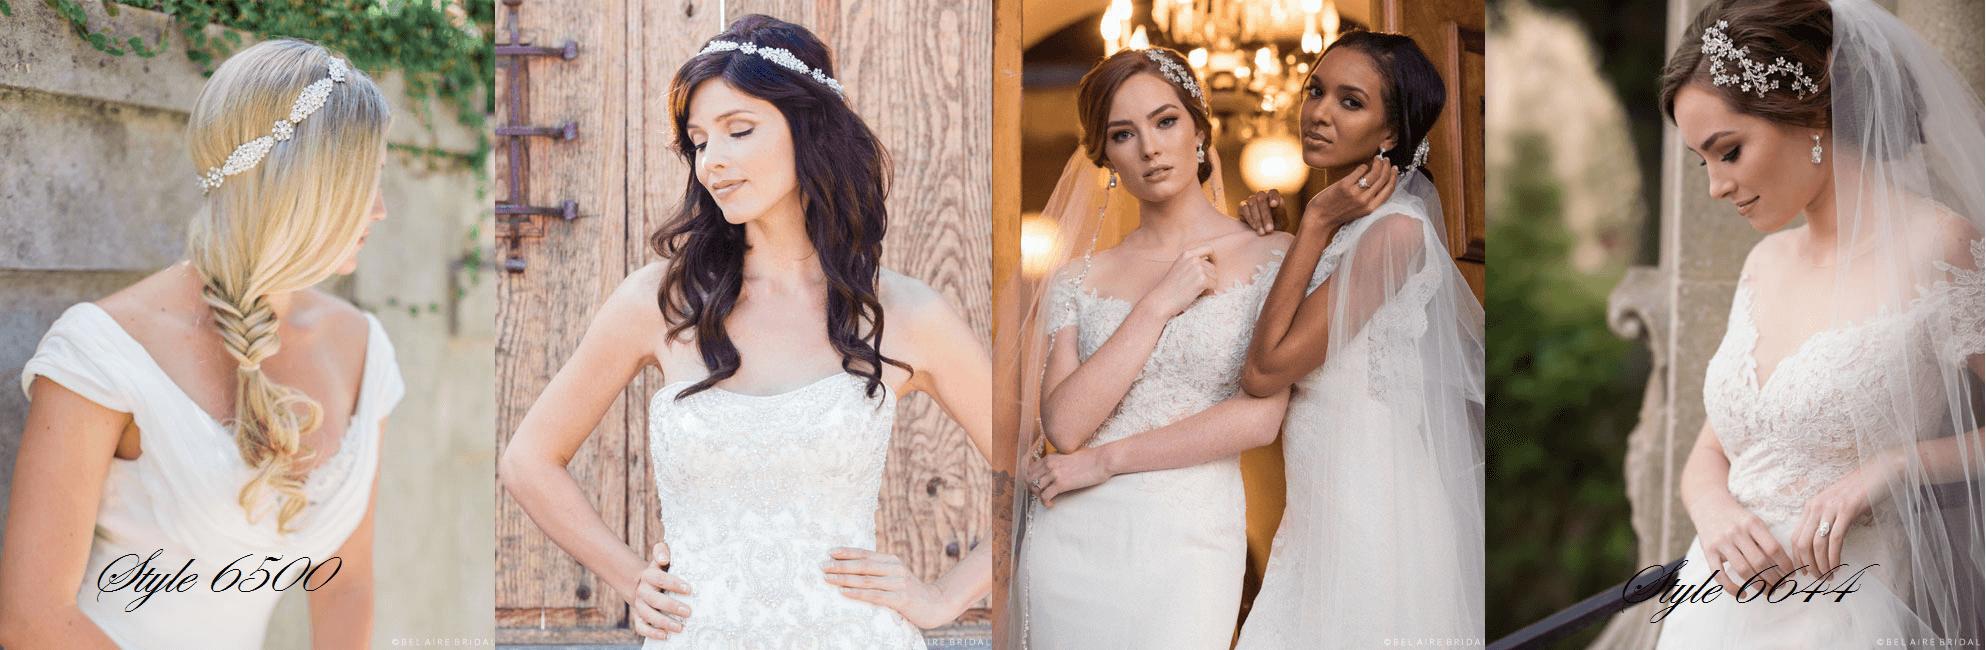 Bel Aire Bridal Style 6500, Bel Aire Bridal Halos, Bel Aire Bridal Veils